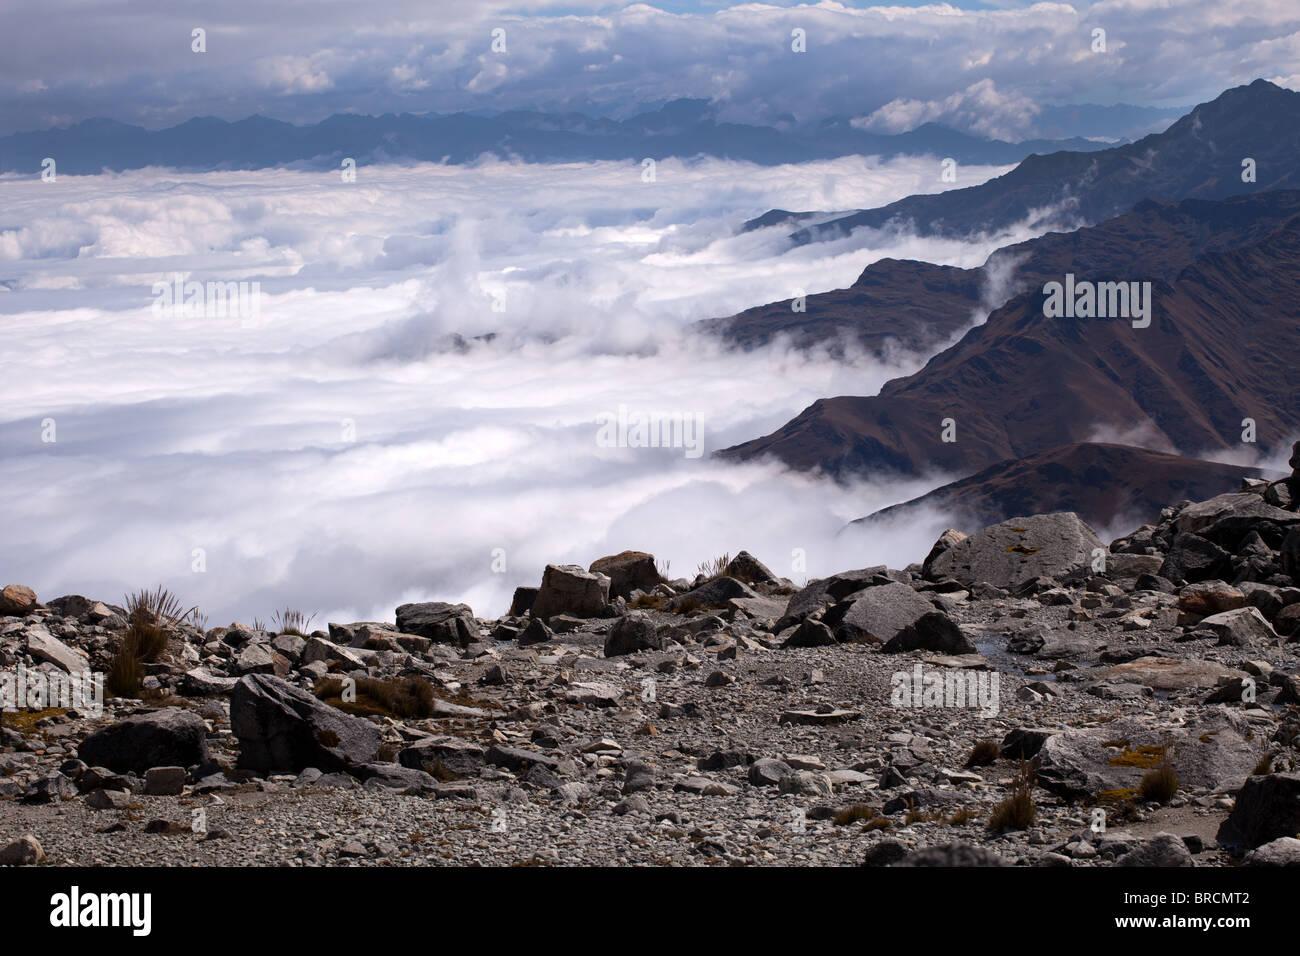 Cordillera Real: Laguna Glacial Trek: Above the Clouds - Stock Image